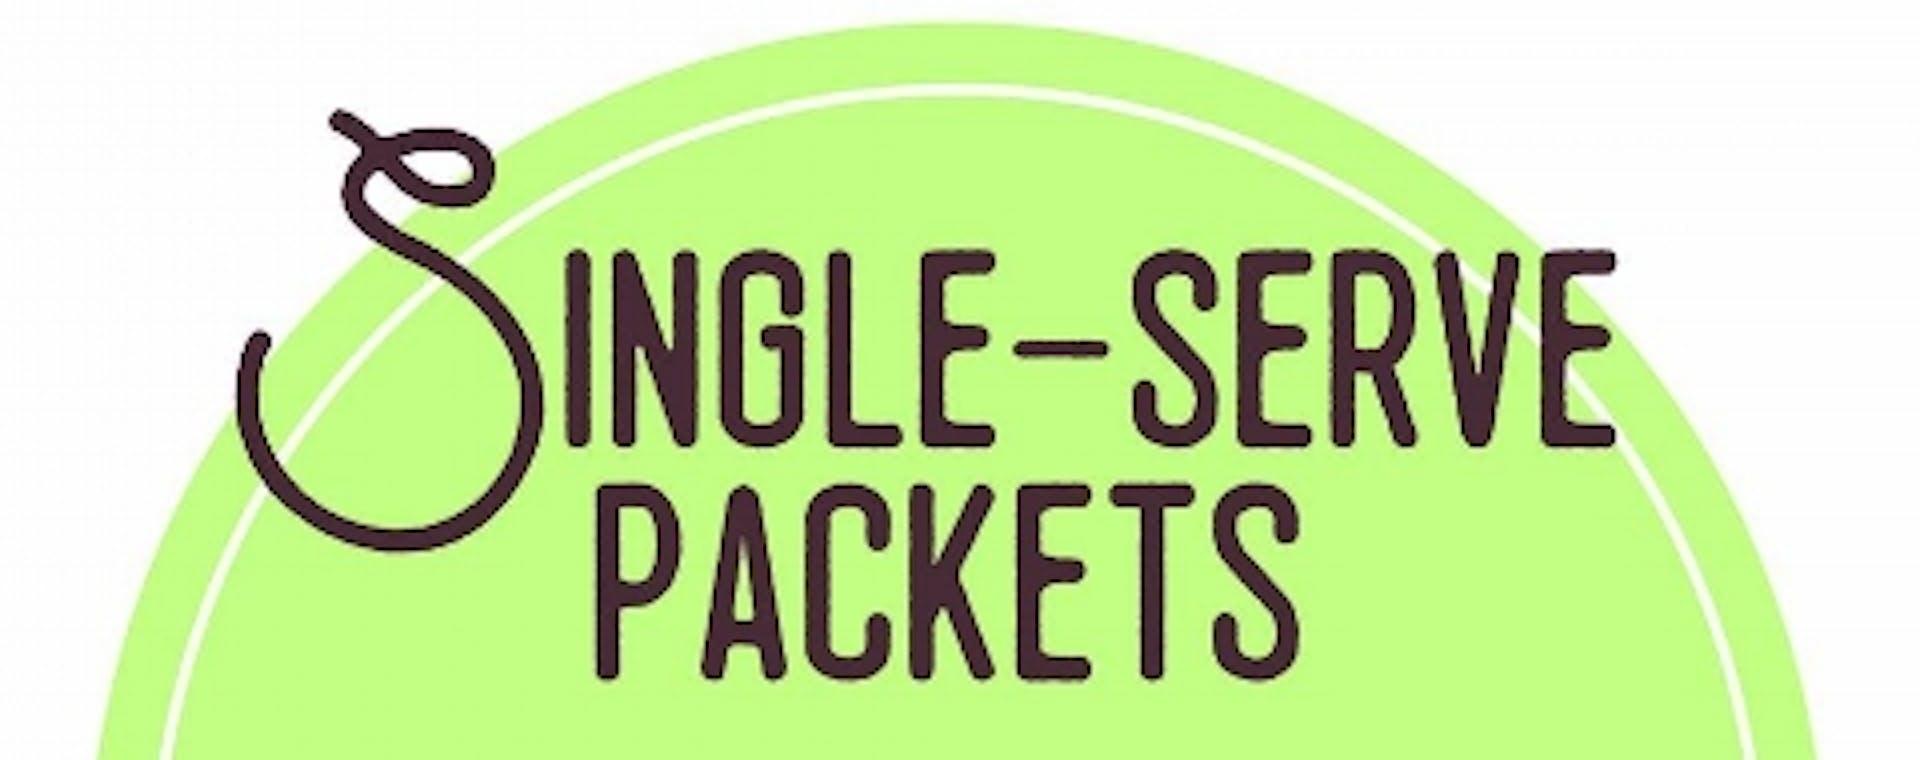 Introducing Epicurean Butter Singe Serve Packets